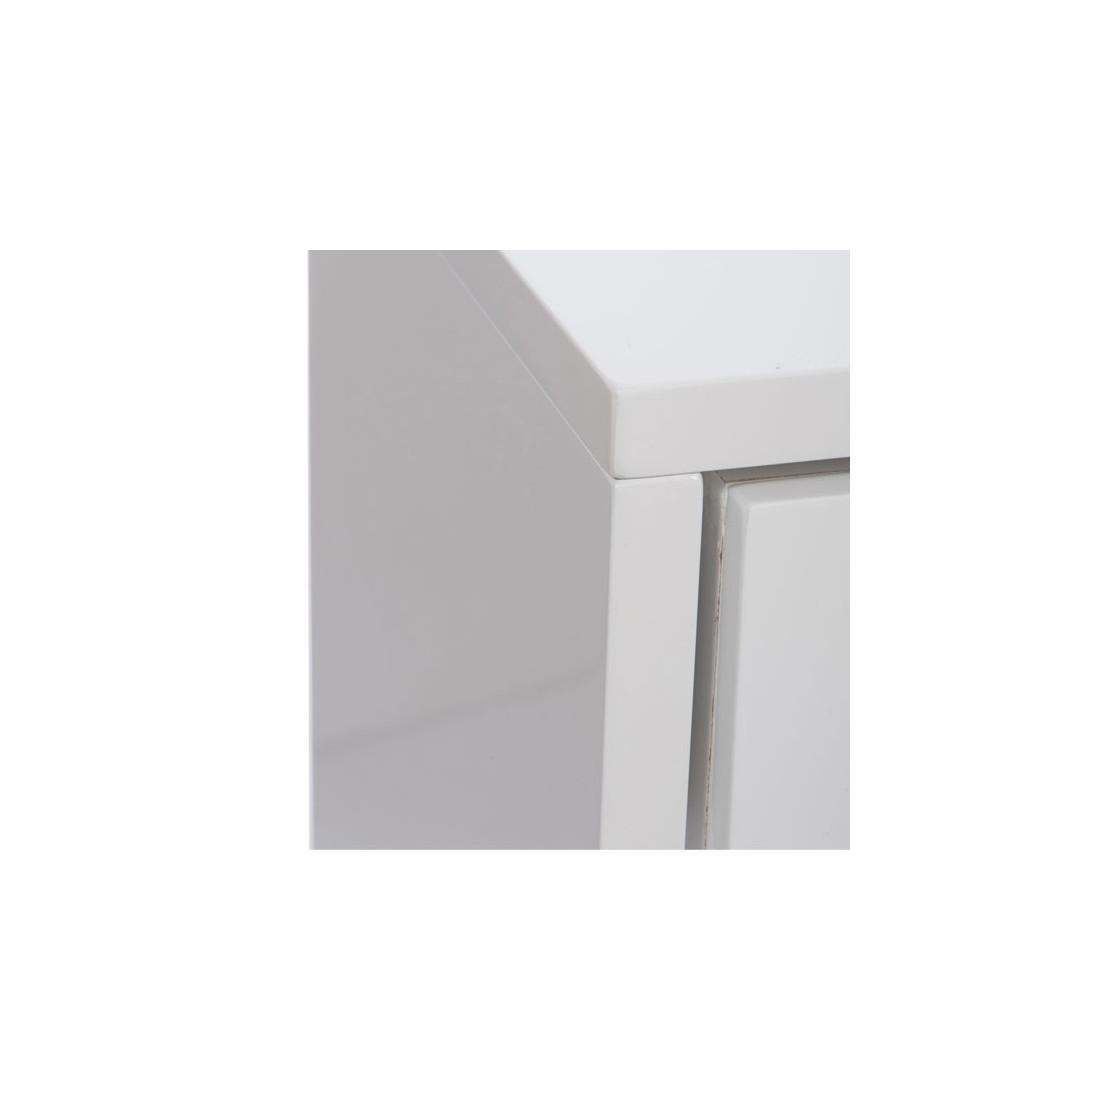 Console 2 tiroirs laqu blanc lina petits meubles for Petit meuble tiroir blanc